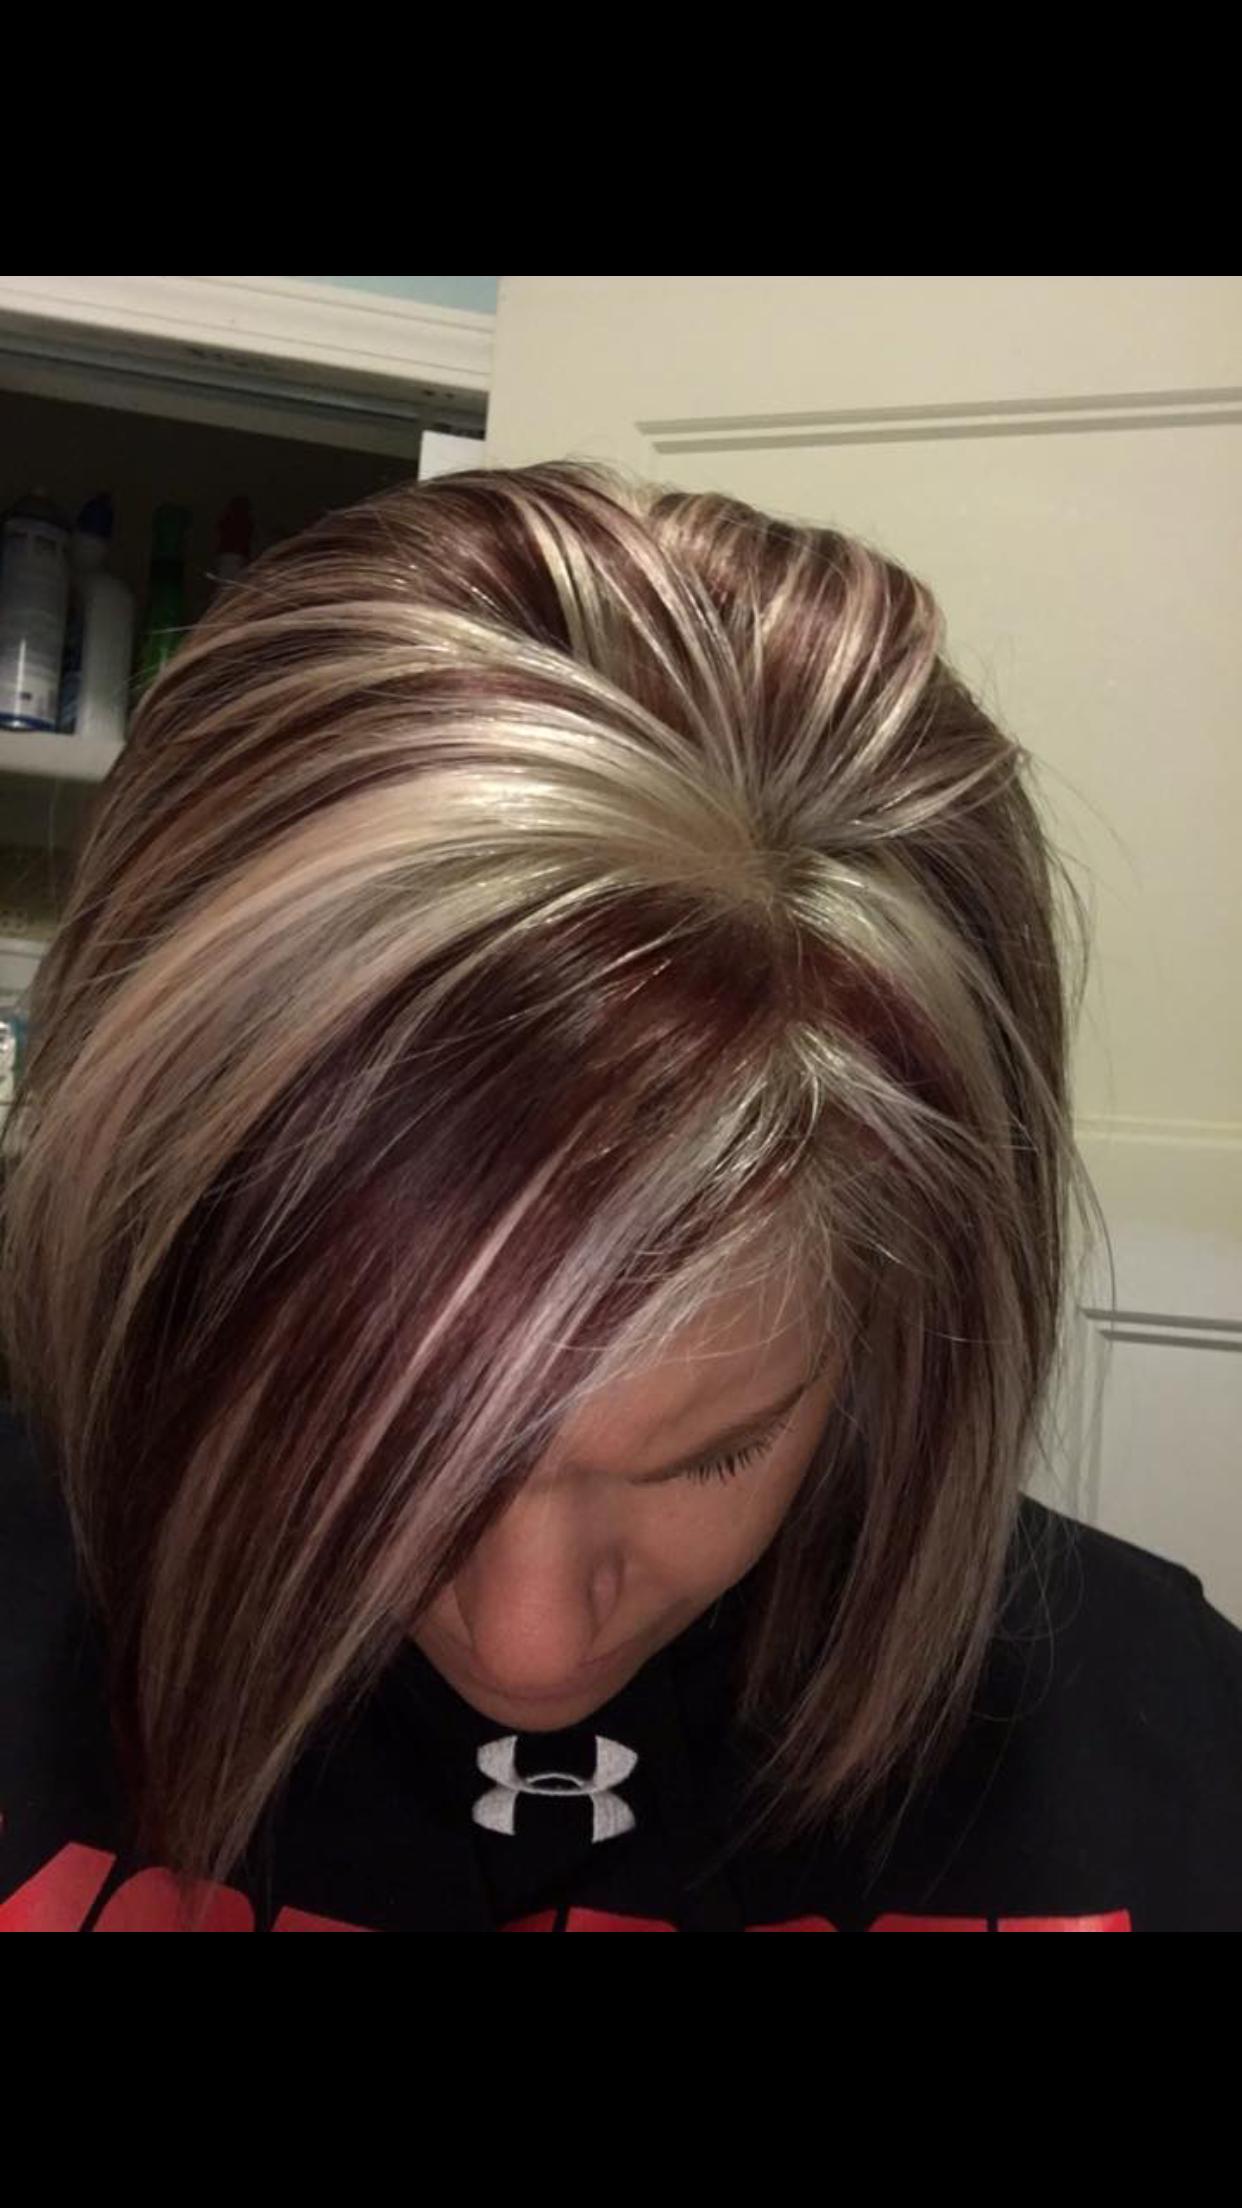 debbie hairs haircoloring hair colors styles tips pinterest coiffures cheveux et. Black Bedroom Furniture Sets. Home Design Ideas